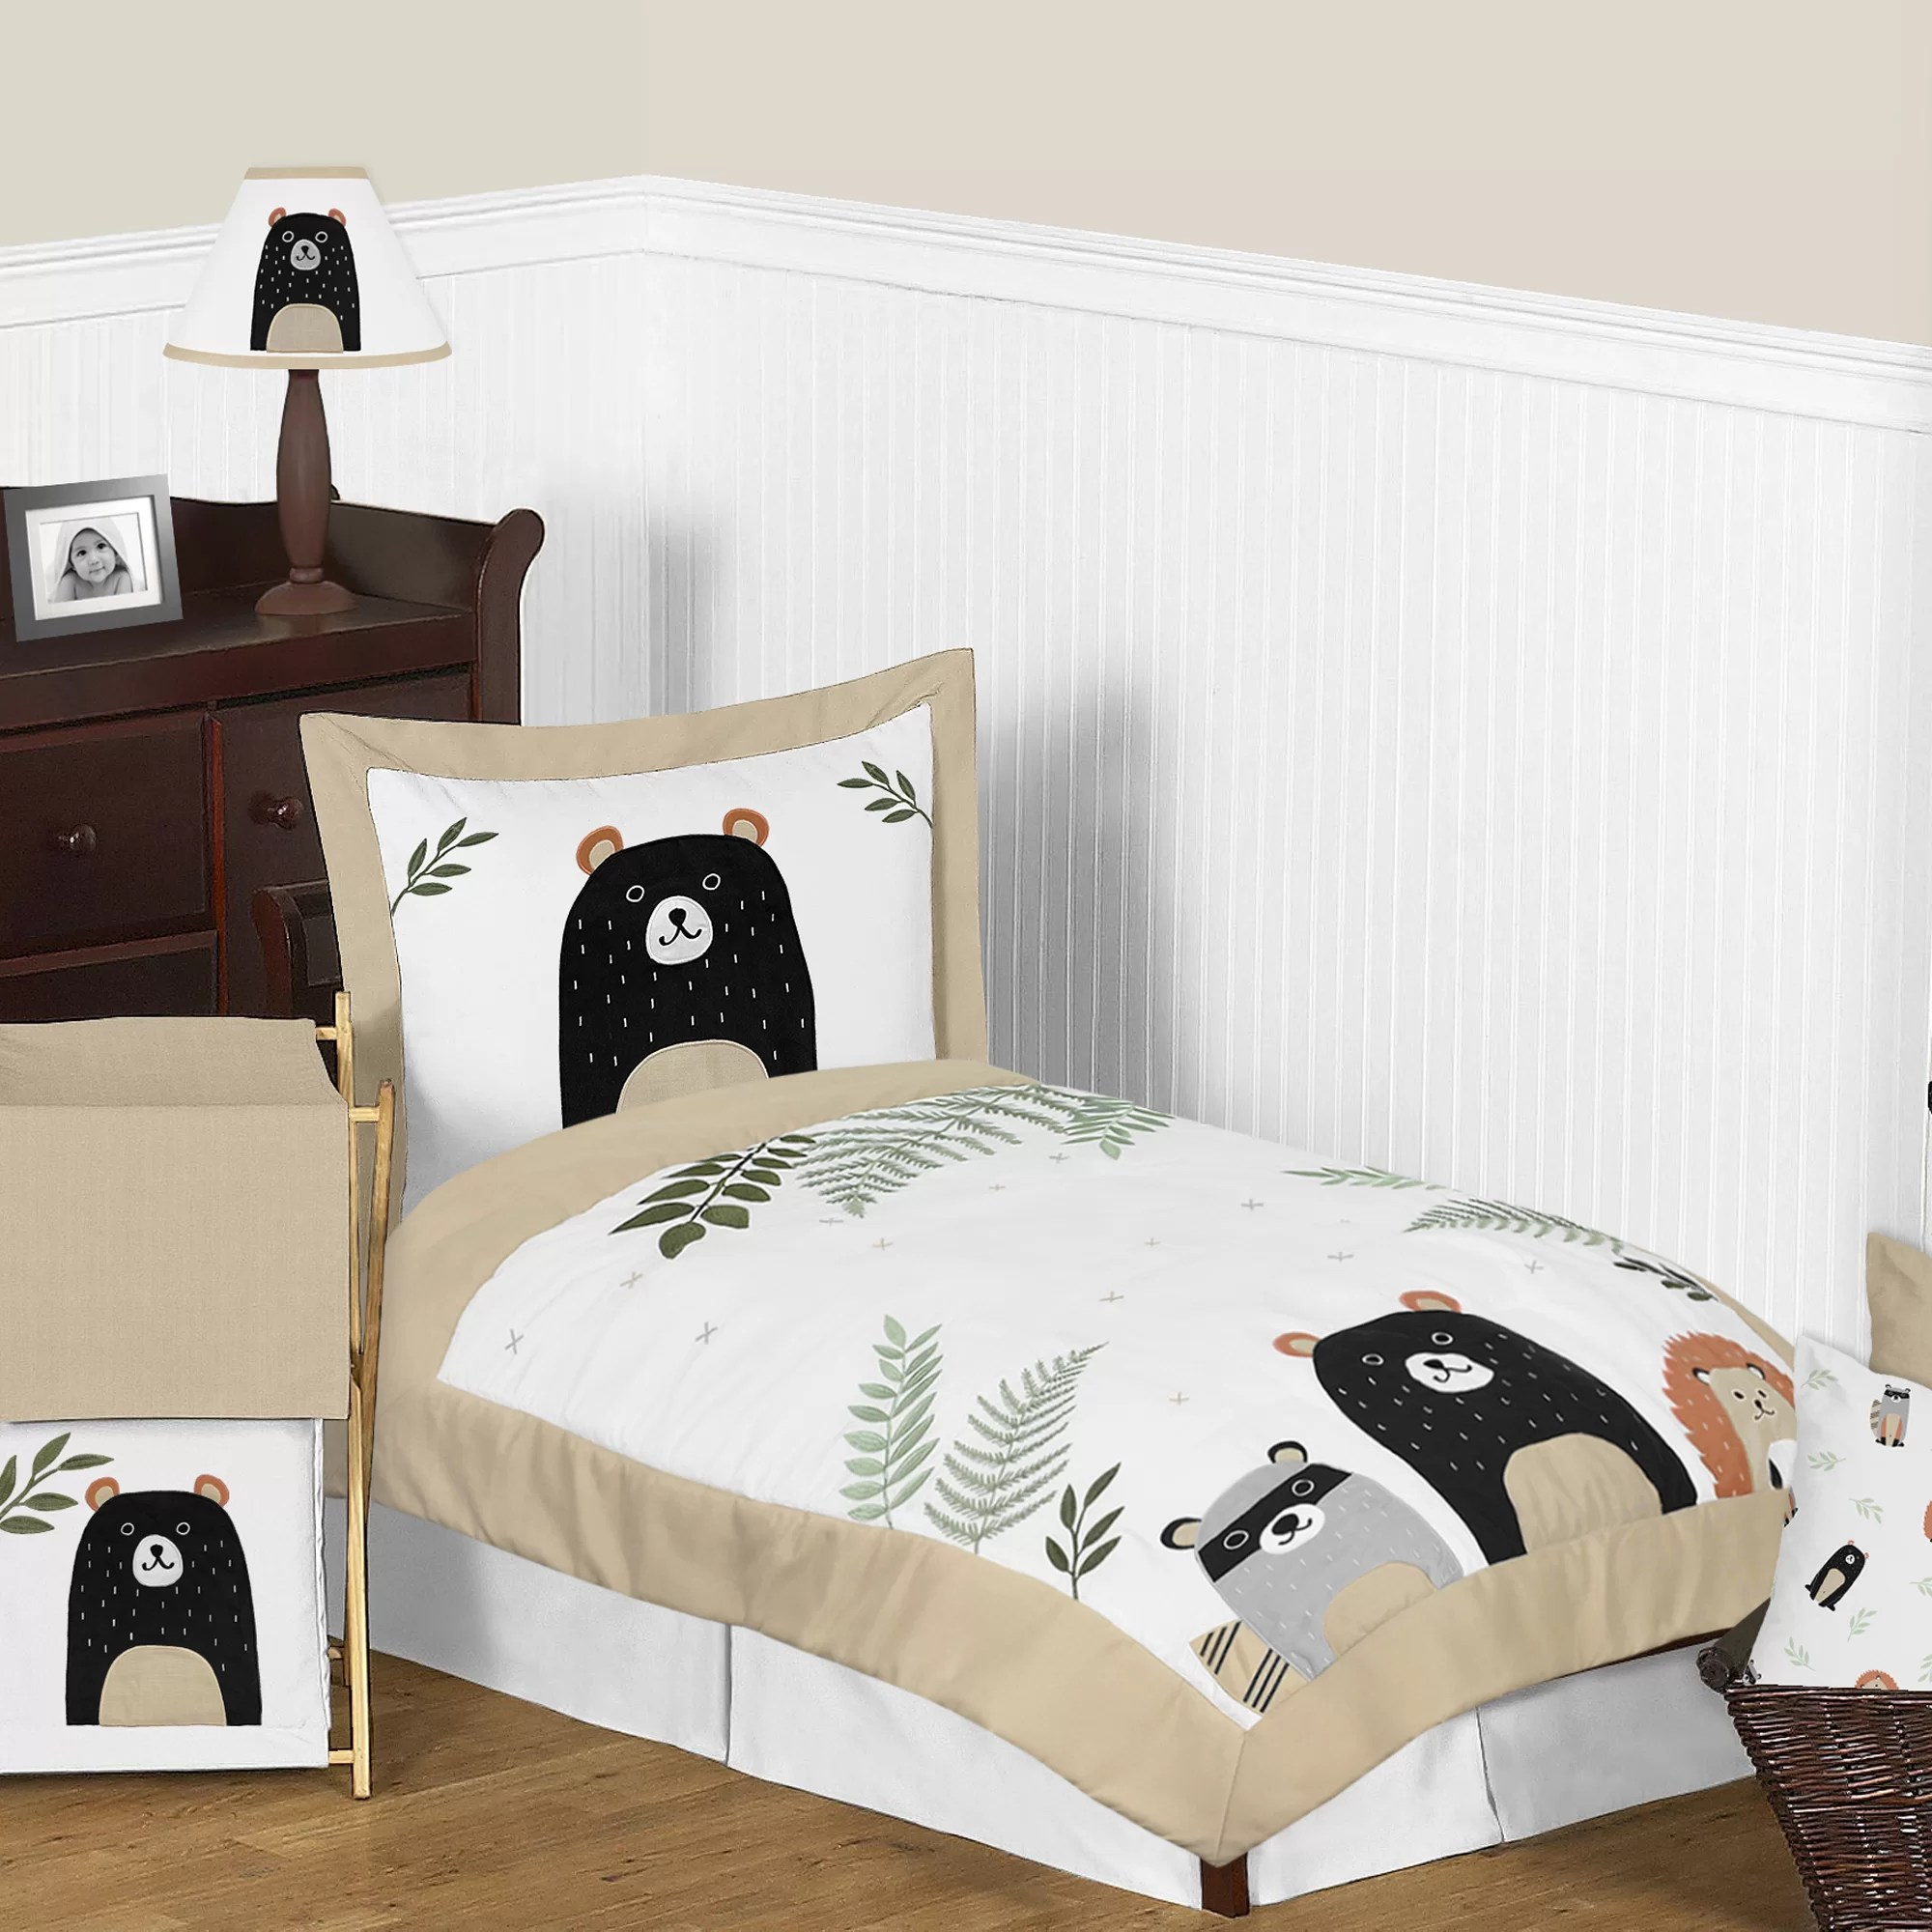 Sweet Jojo Designs The Woodland Pals 5 Piece Toddler Bedding Set Wayfair